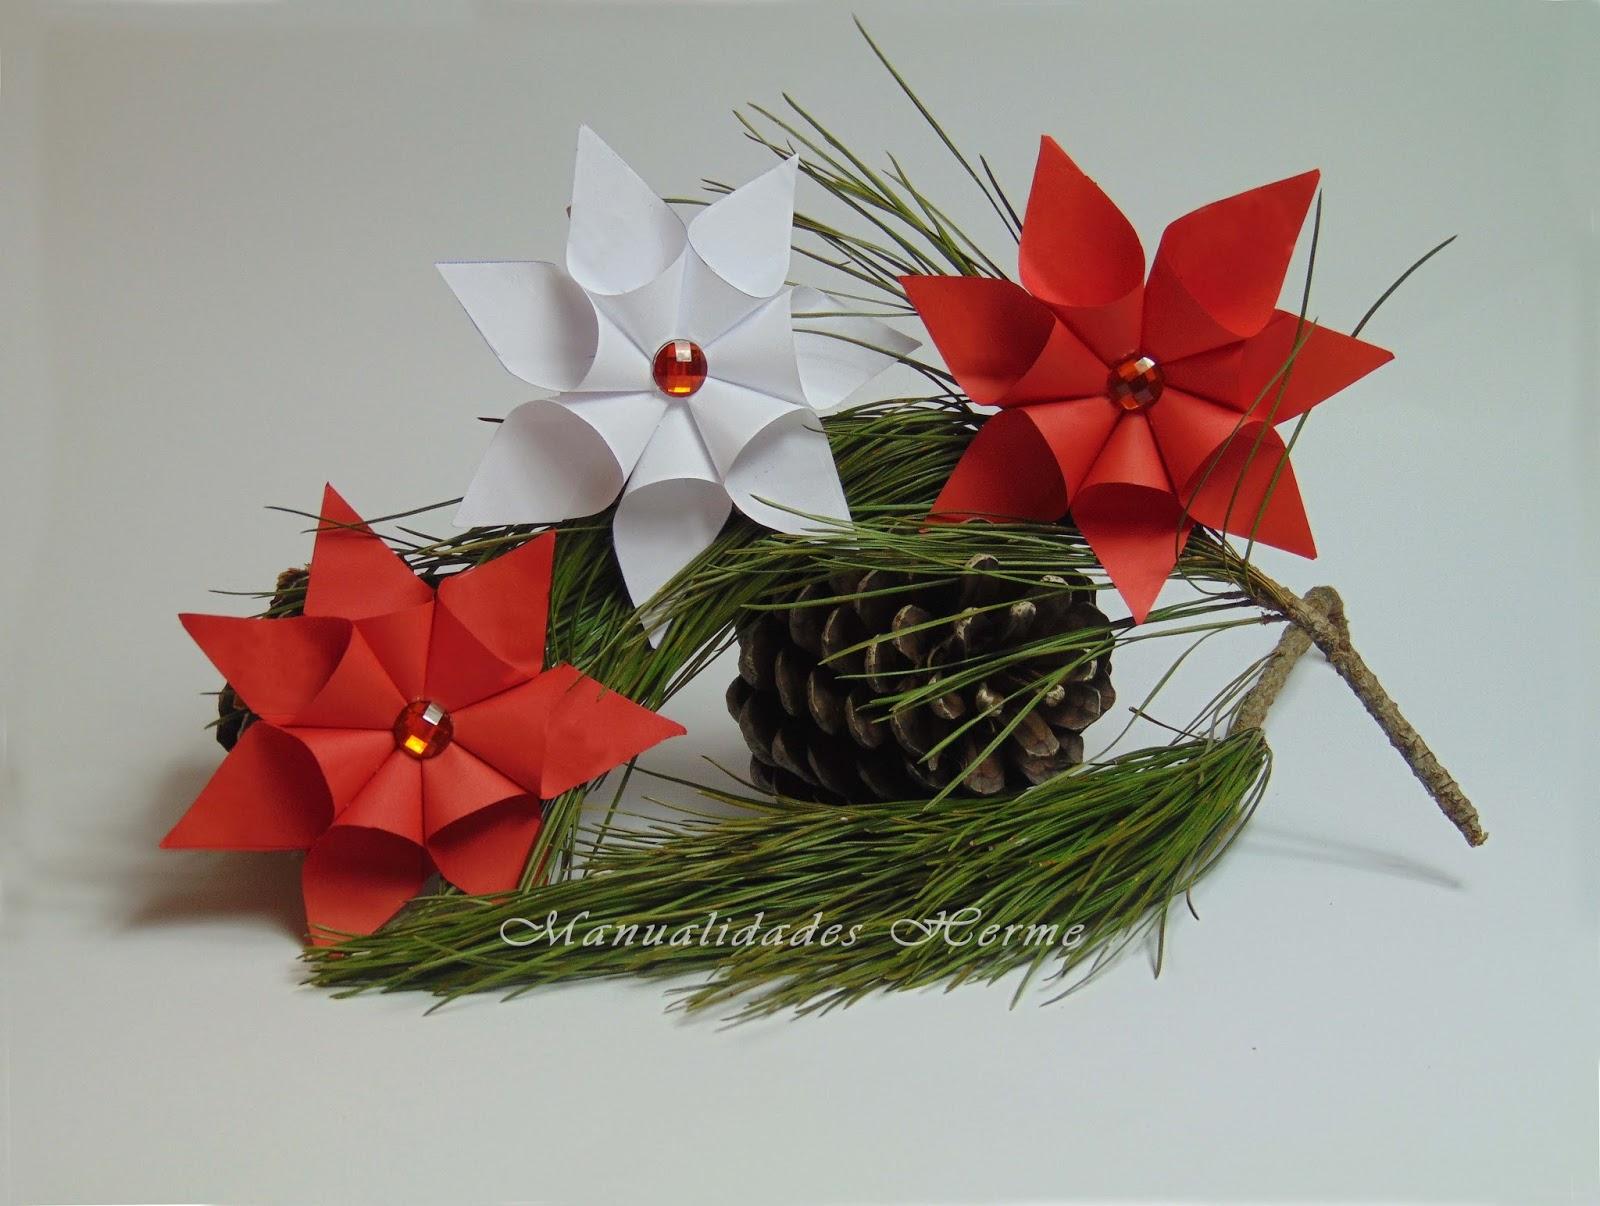 Manualidades herme diy flor de nochebuena - Www como hacer flores com ...